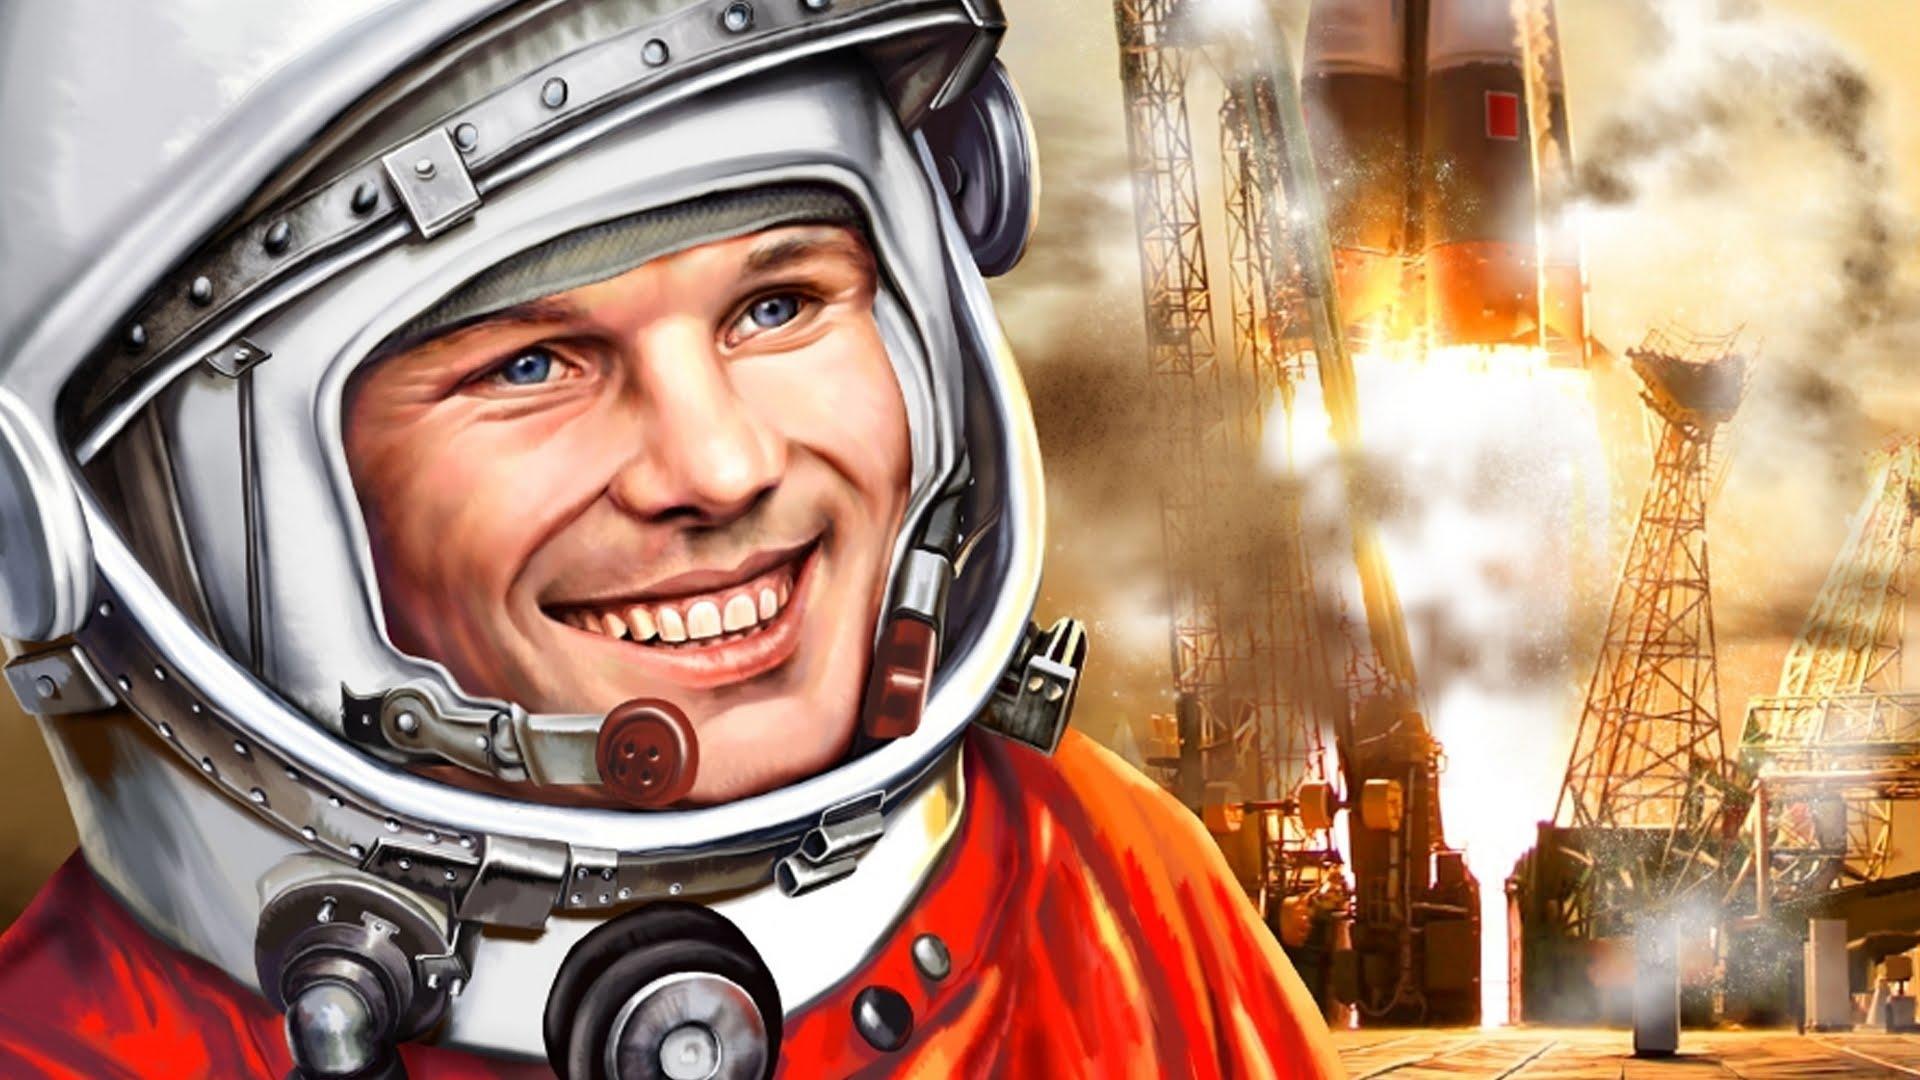 Юрий Гагарин, человек, космонавт, лётчик, легенда, герой, улыбка, космос, СССР, старт, пуск, космодром, Байконур, наука, техника, космонавтка, скафандр